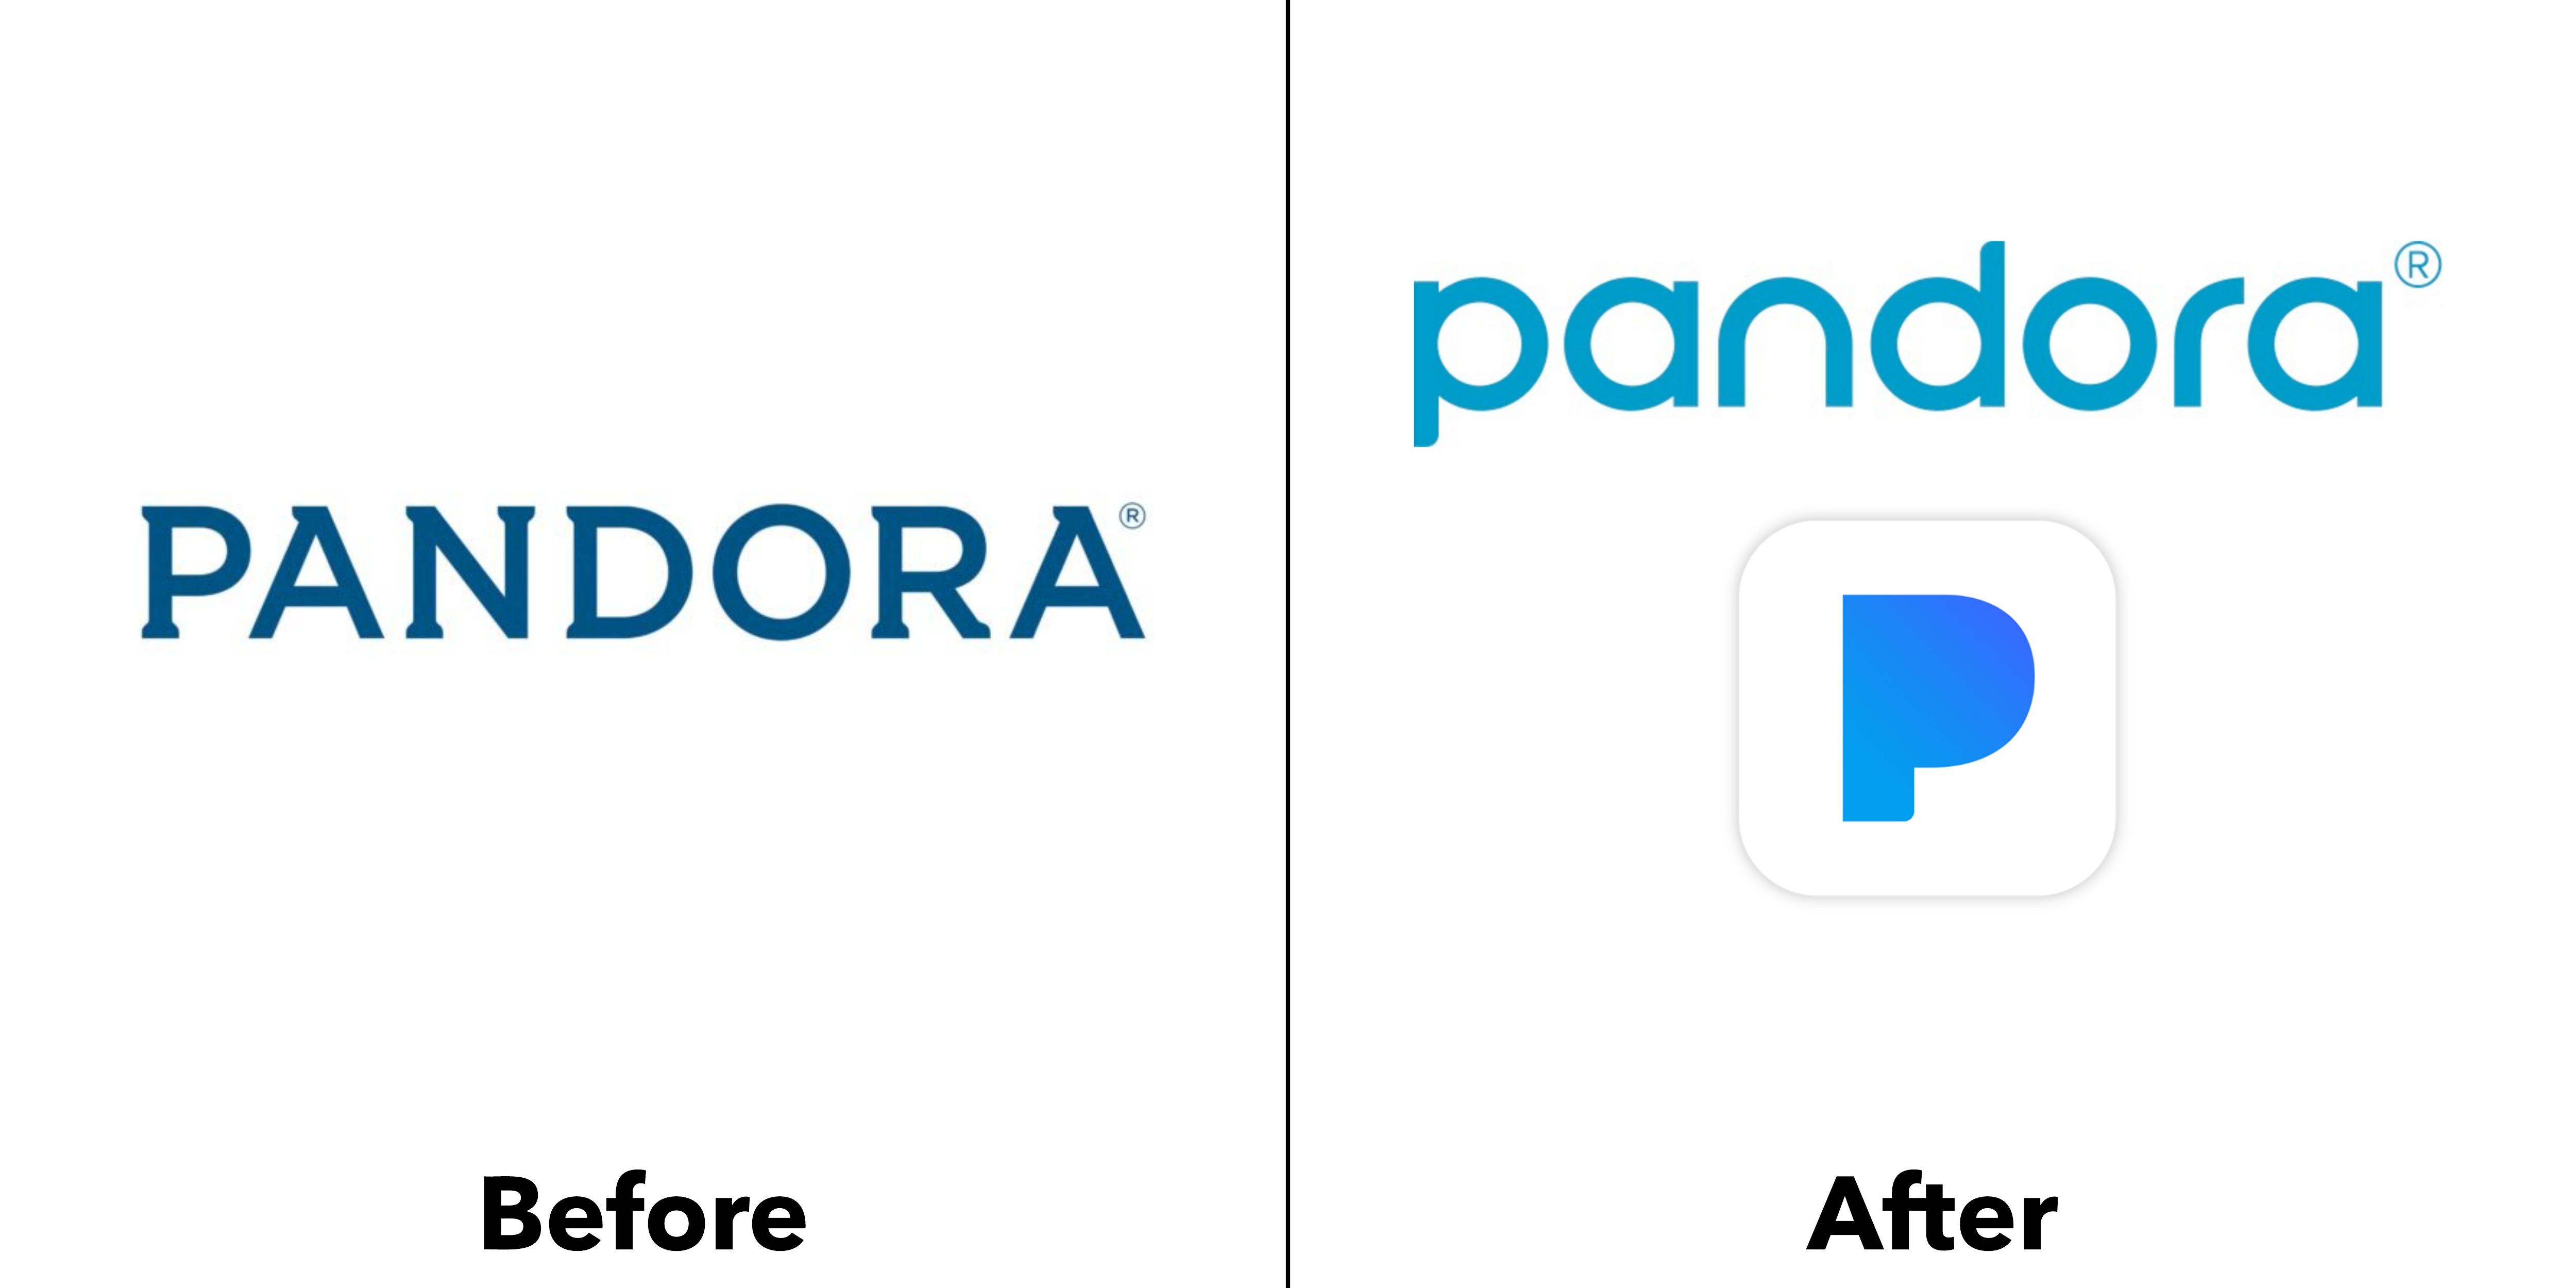 10 Best Branding  for Corporate Logo Design Examples  174mzq